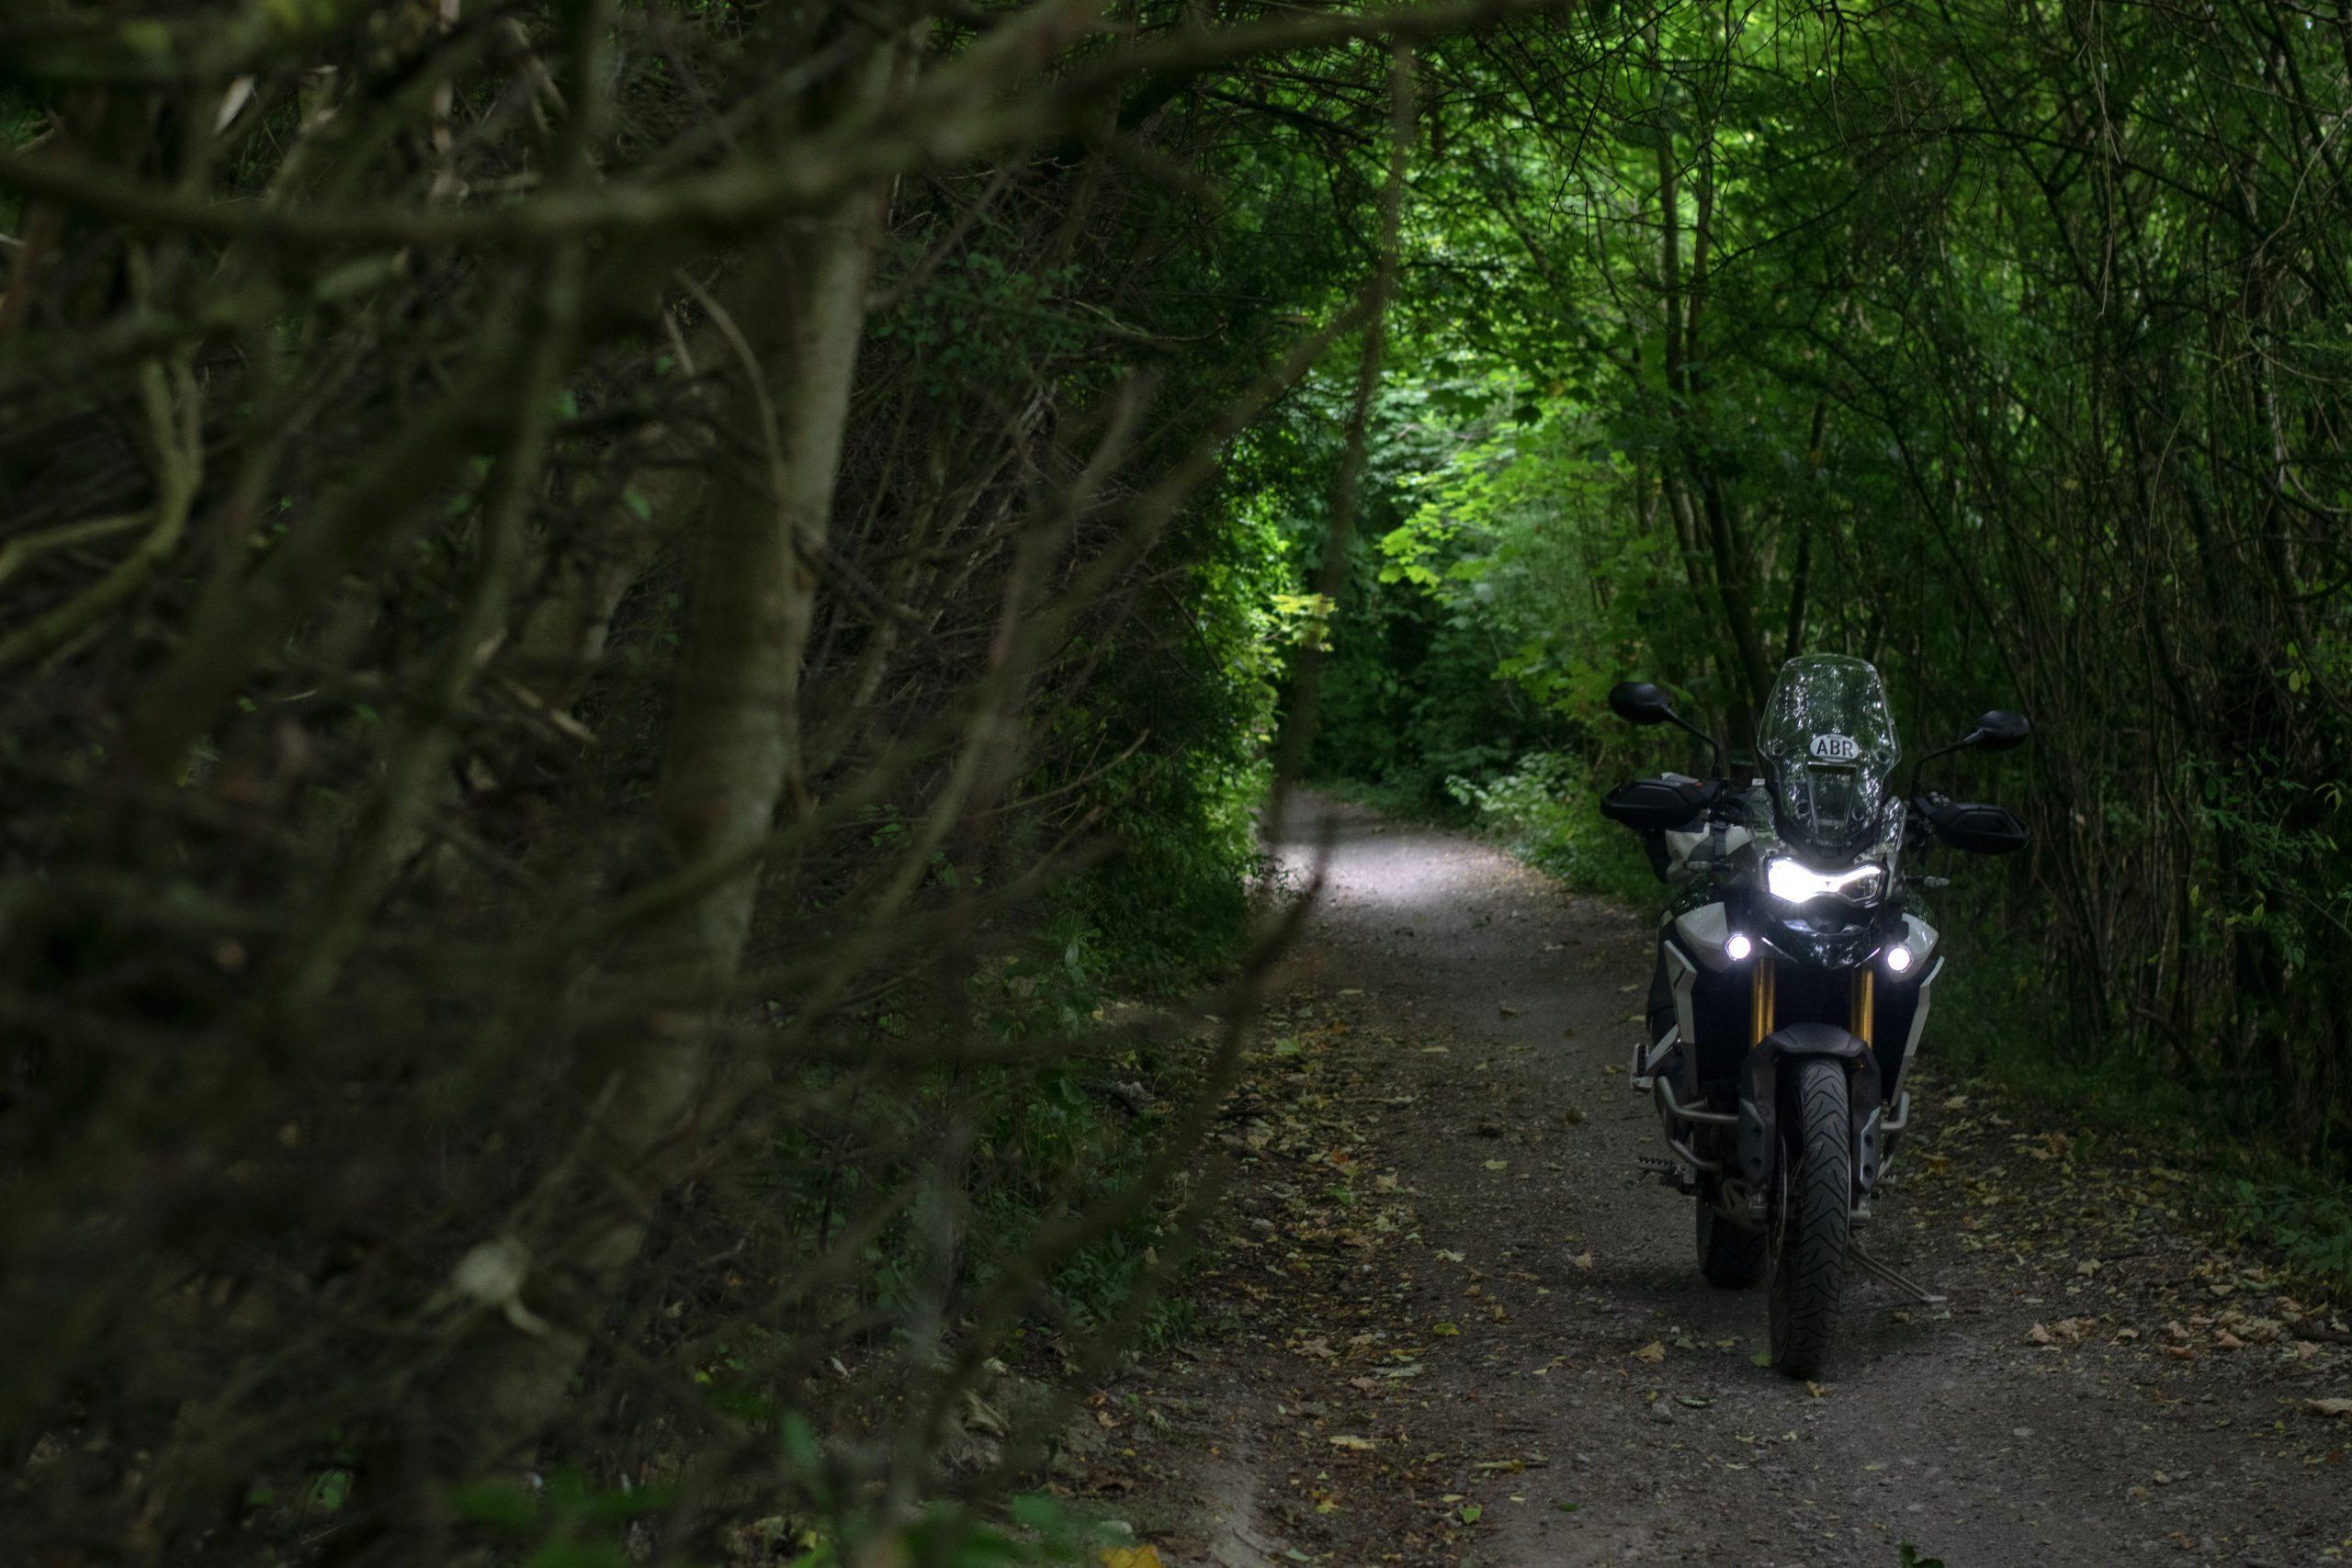 finding green lanes